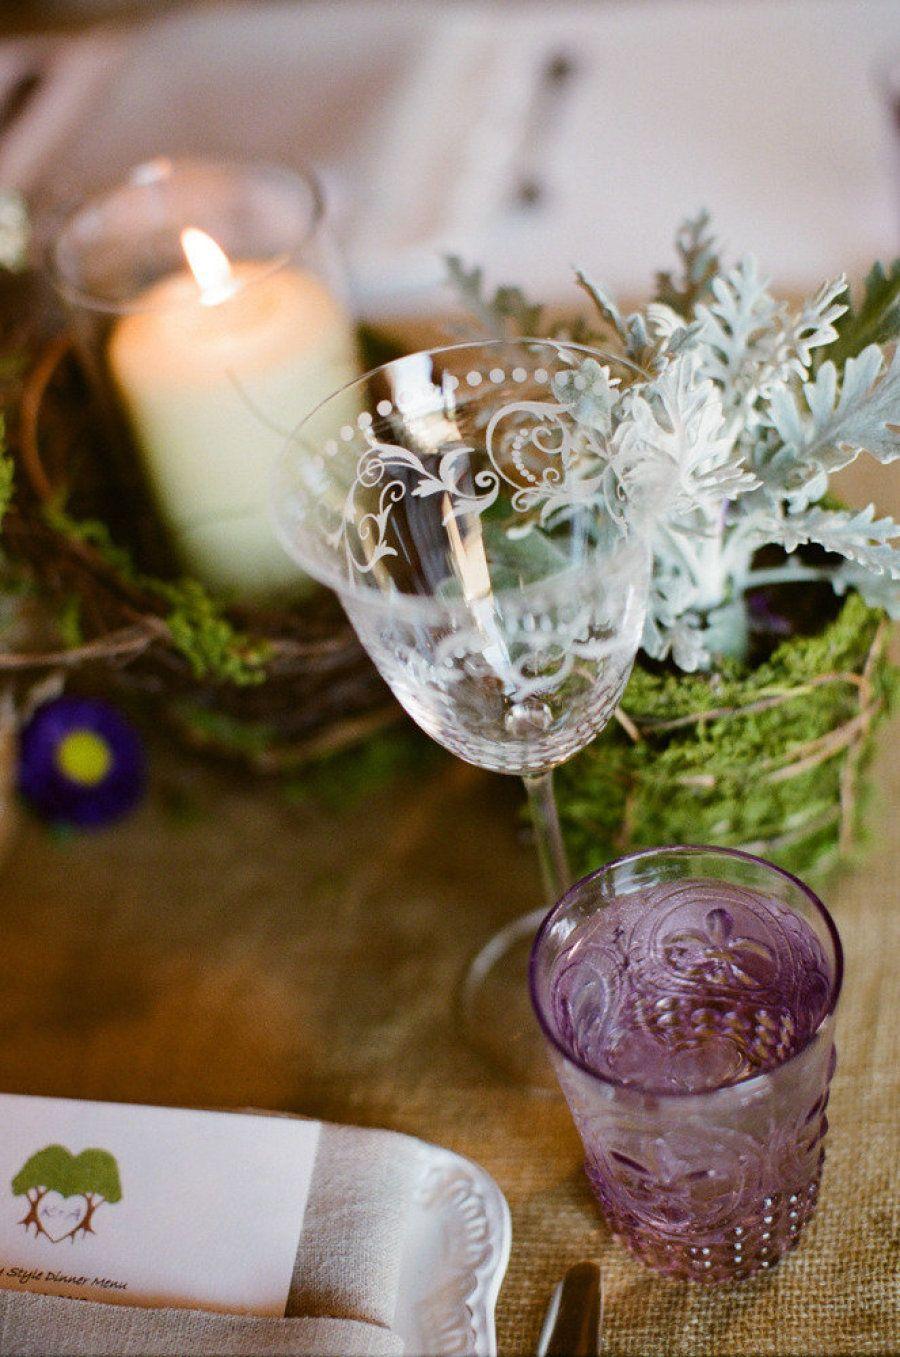 Photography Michael & Anna Costa Photographers Ltd. Event Design + Planning Joy de Vivre Wedding Coordination ~ Style Me Pretty | Gallery & Inspiration |